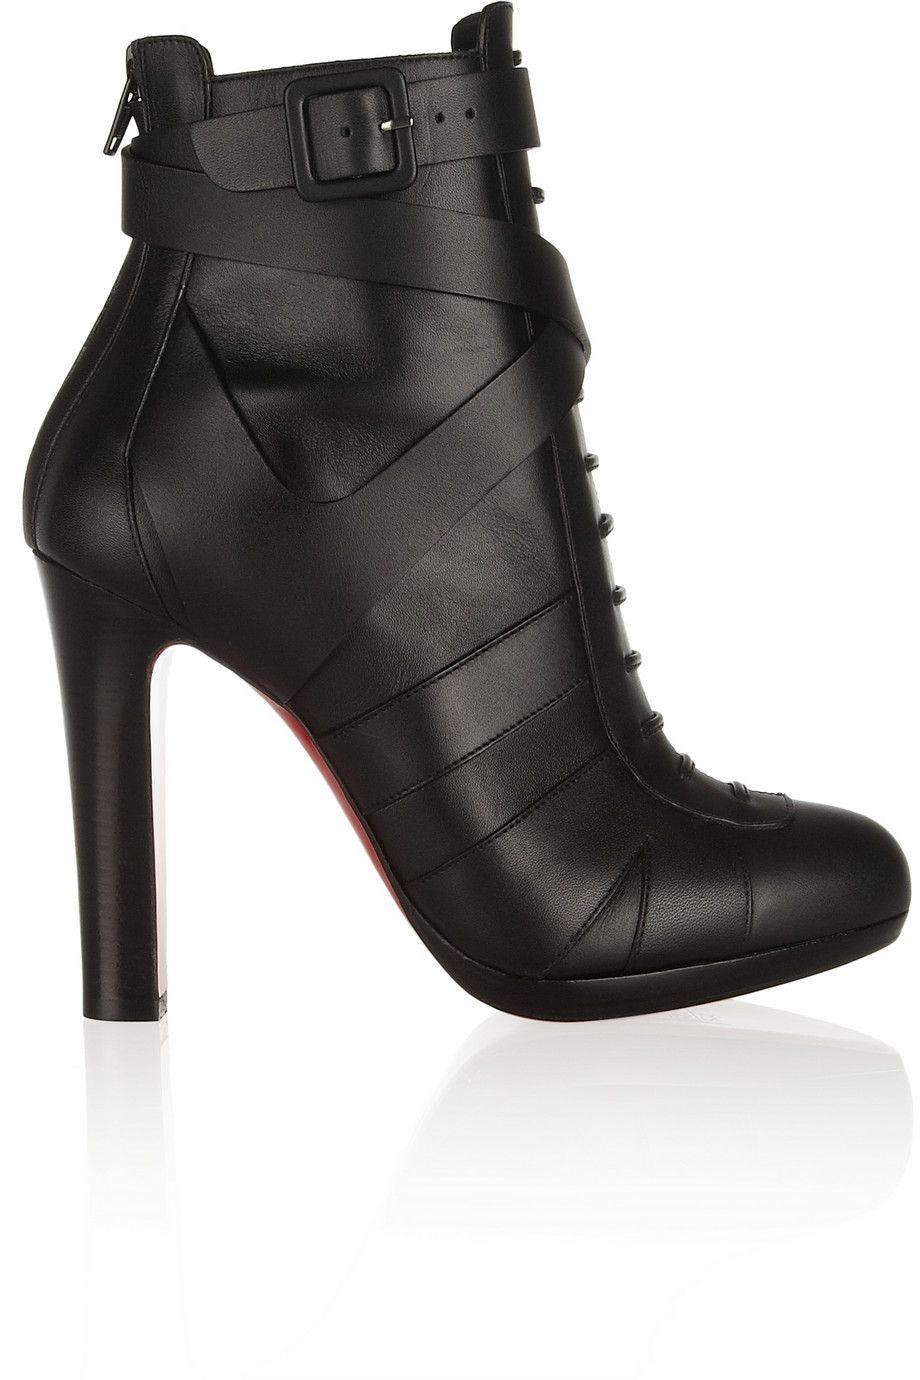 Christian Louboutin|Lamu 120 leather ankle boots|NET-A-PORTER.COM